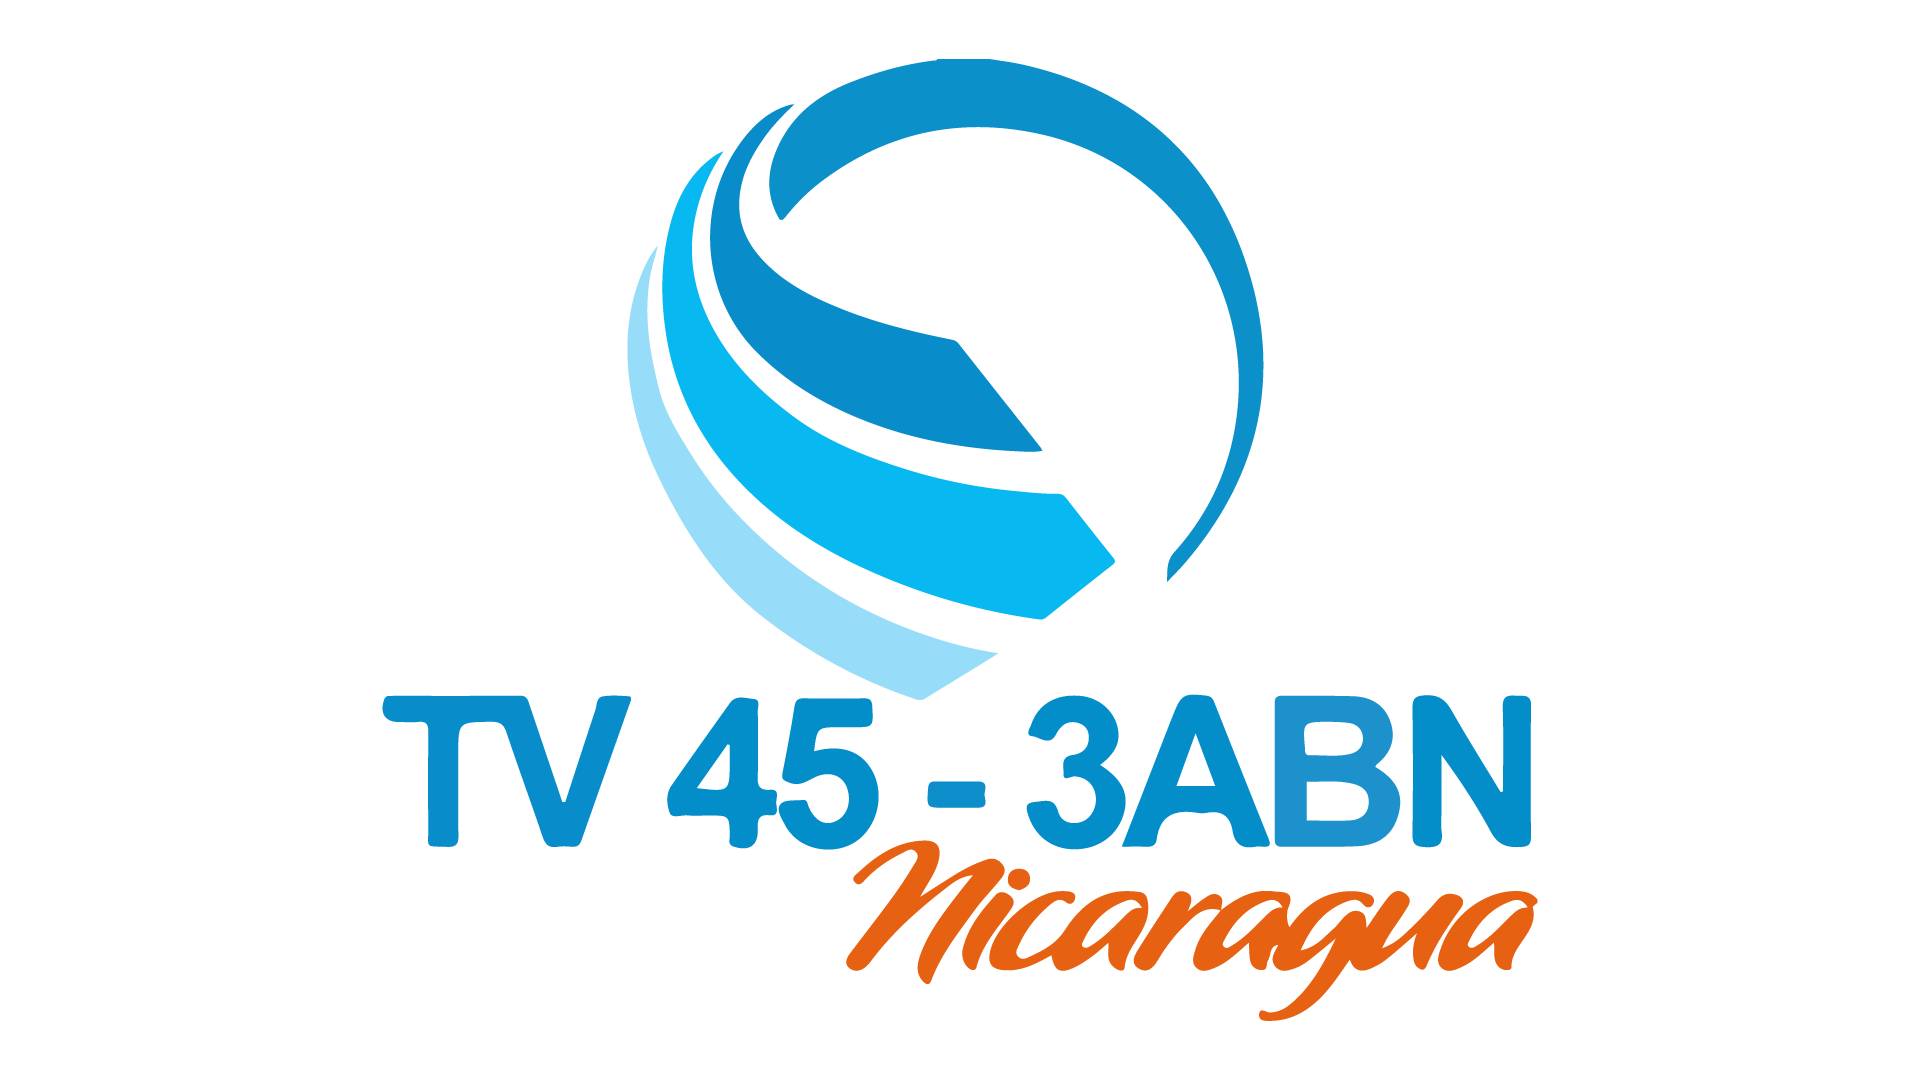 3ABN Nicaragua en vivo, Online